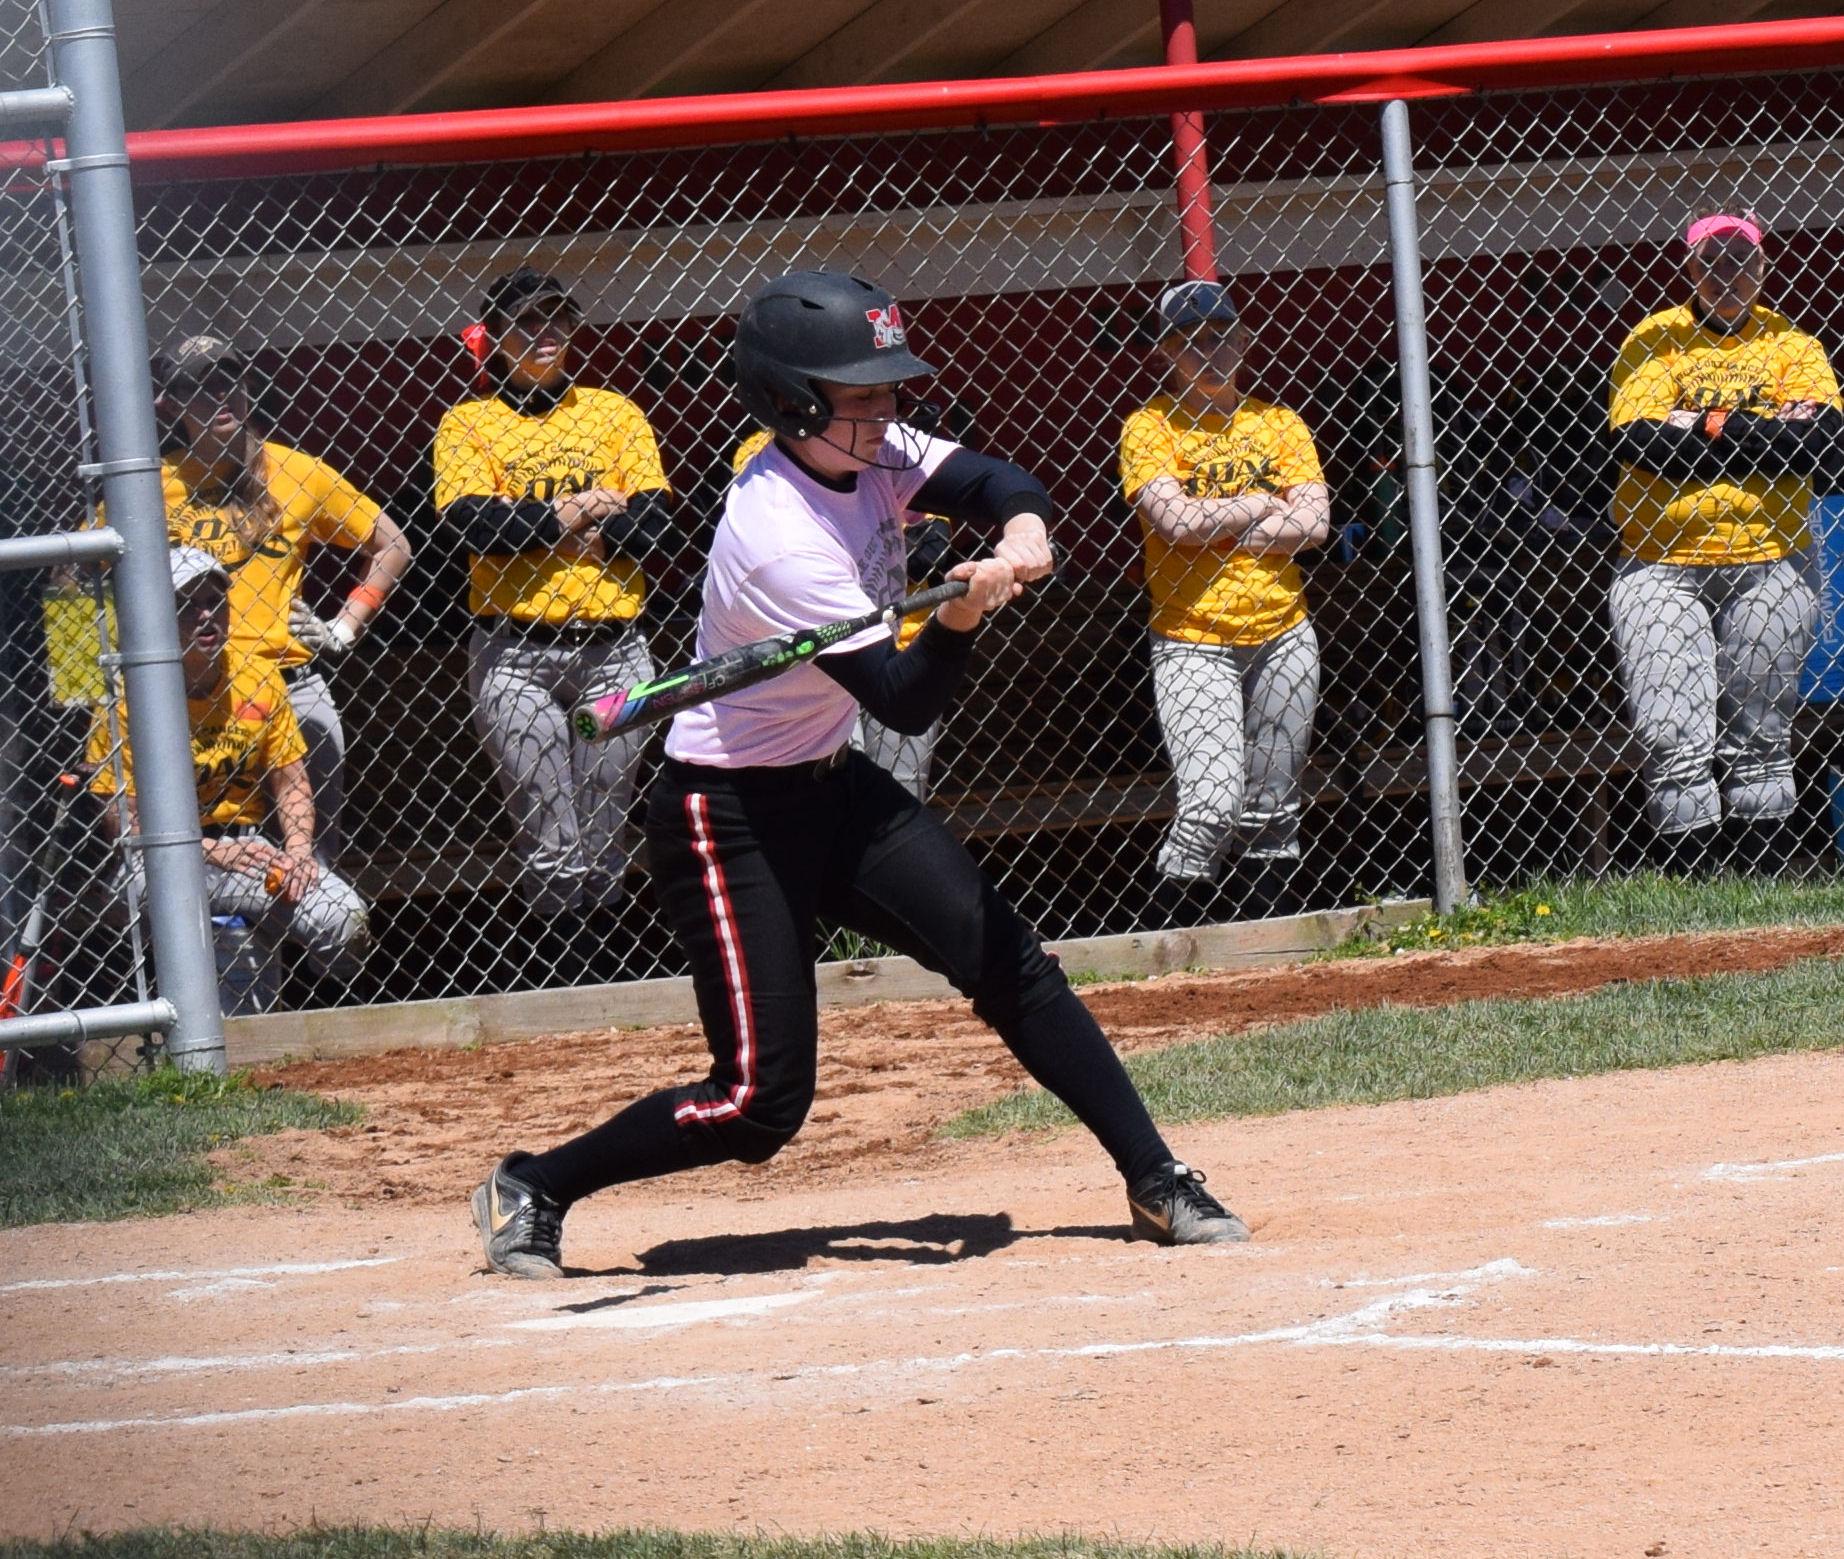 Softball and Baseball Open Seasons in Florida